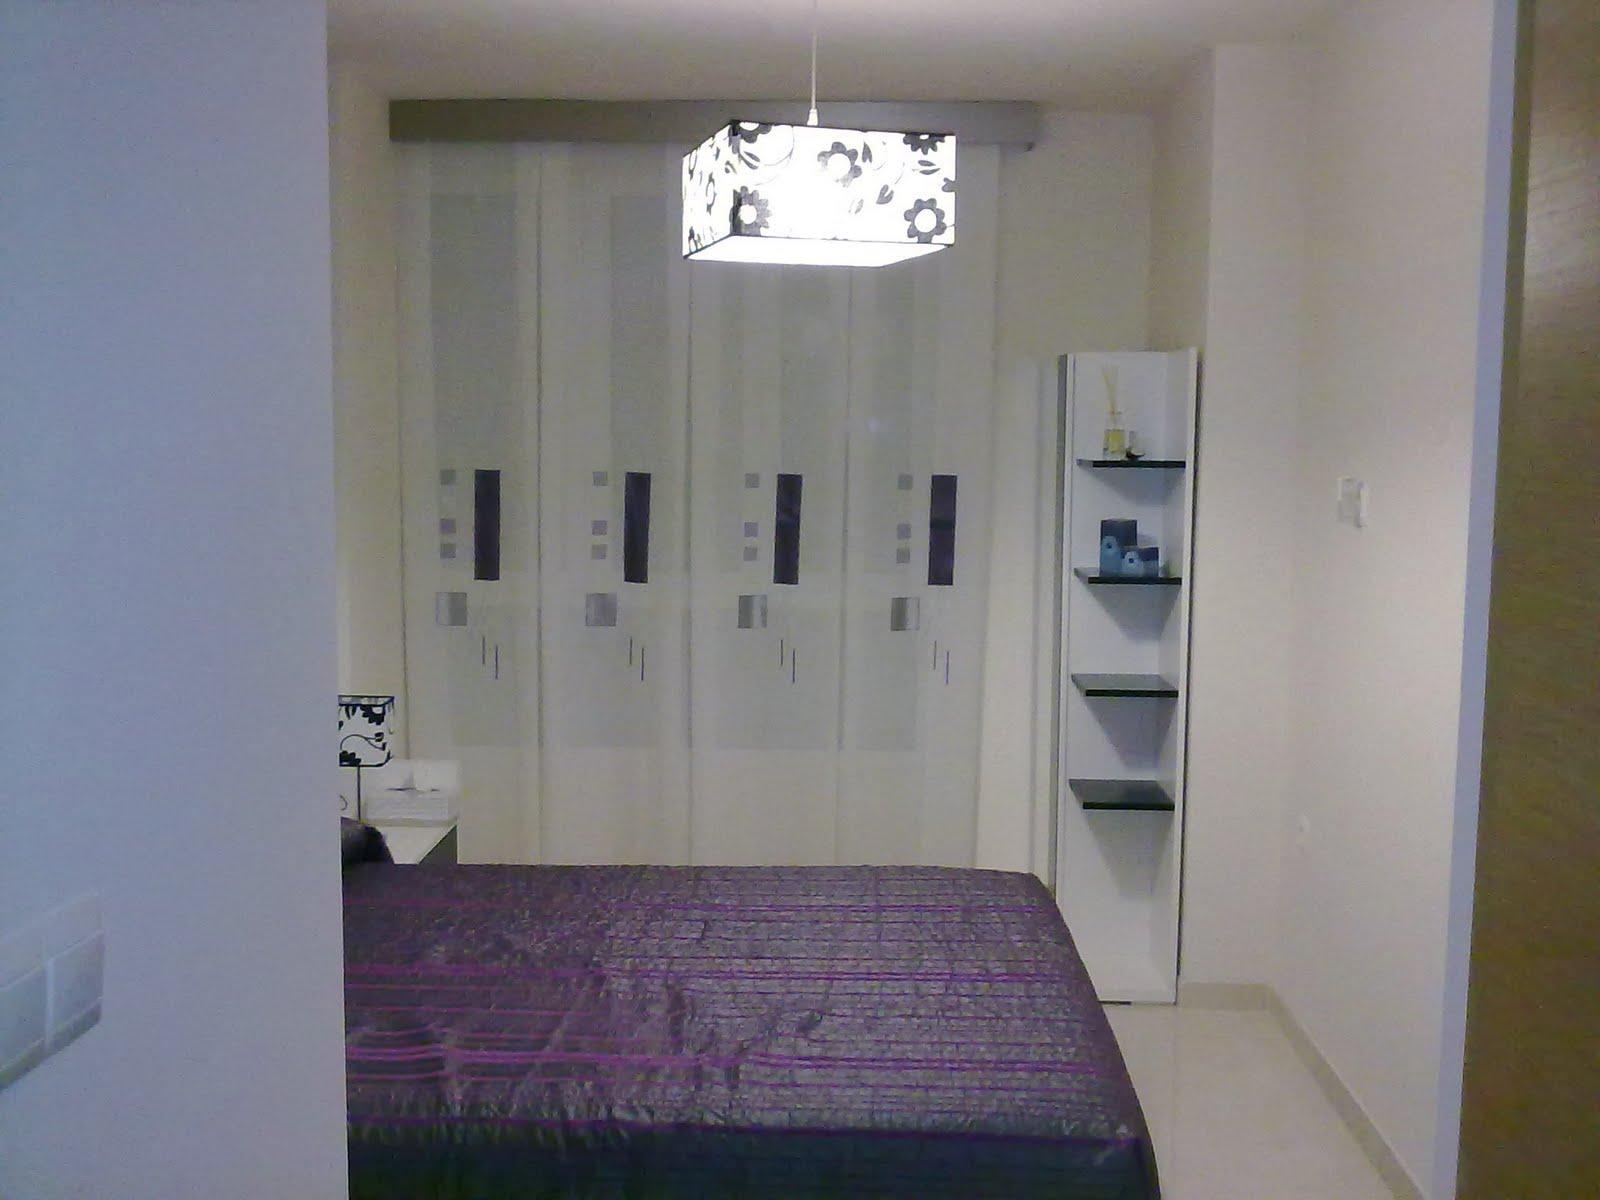 404 not found for Cortinas dormitorio principal